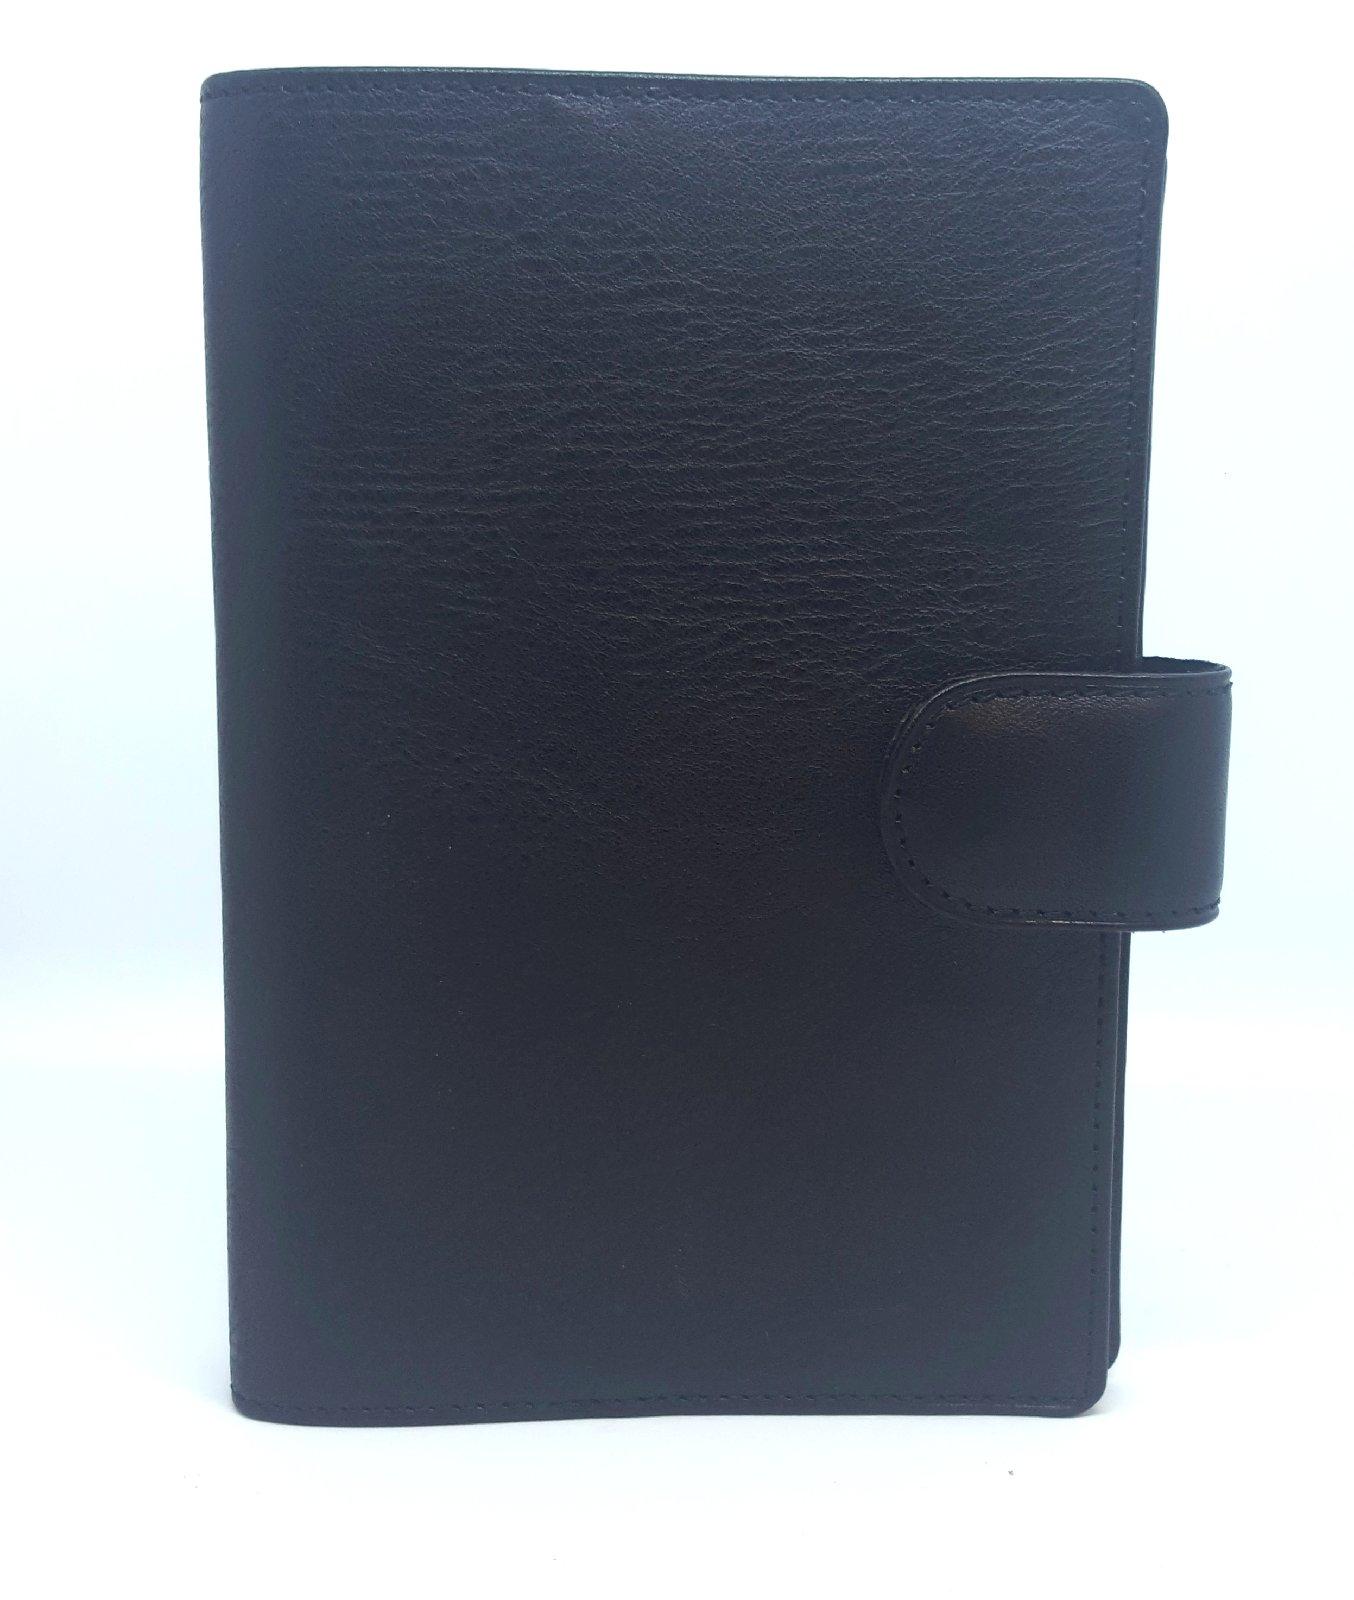 Organiser De Succes Cacao Standard Schwarz Leder 23mm